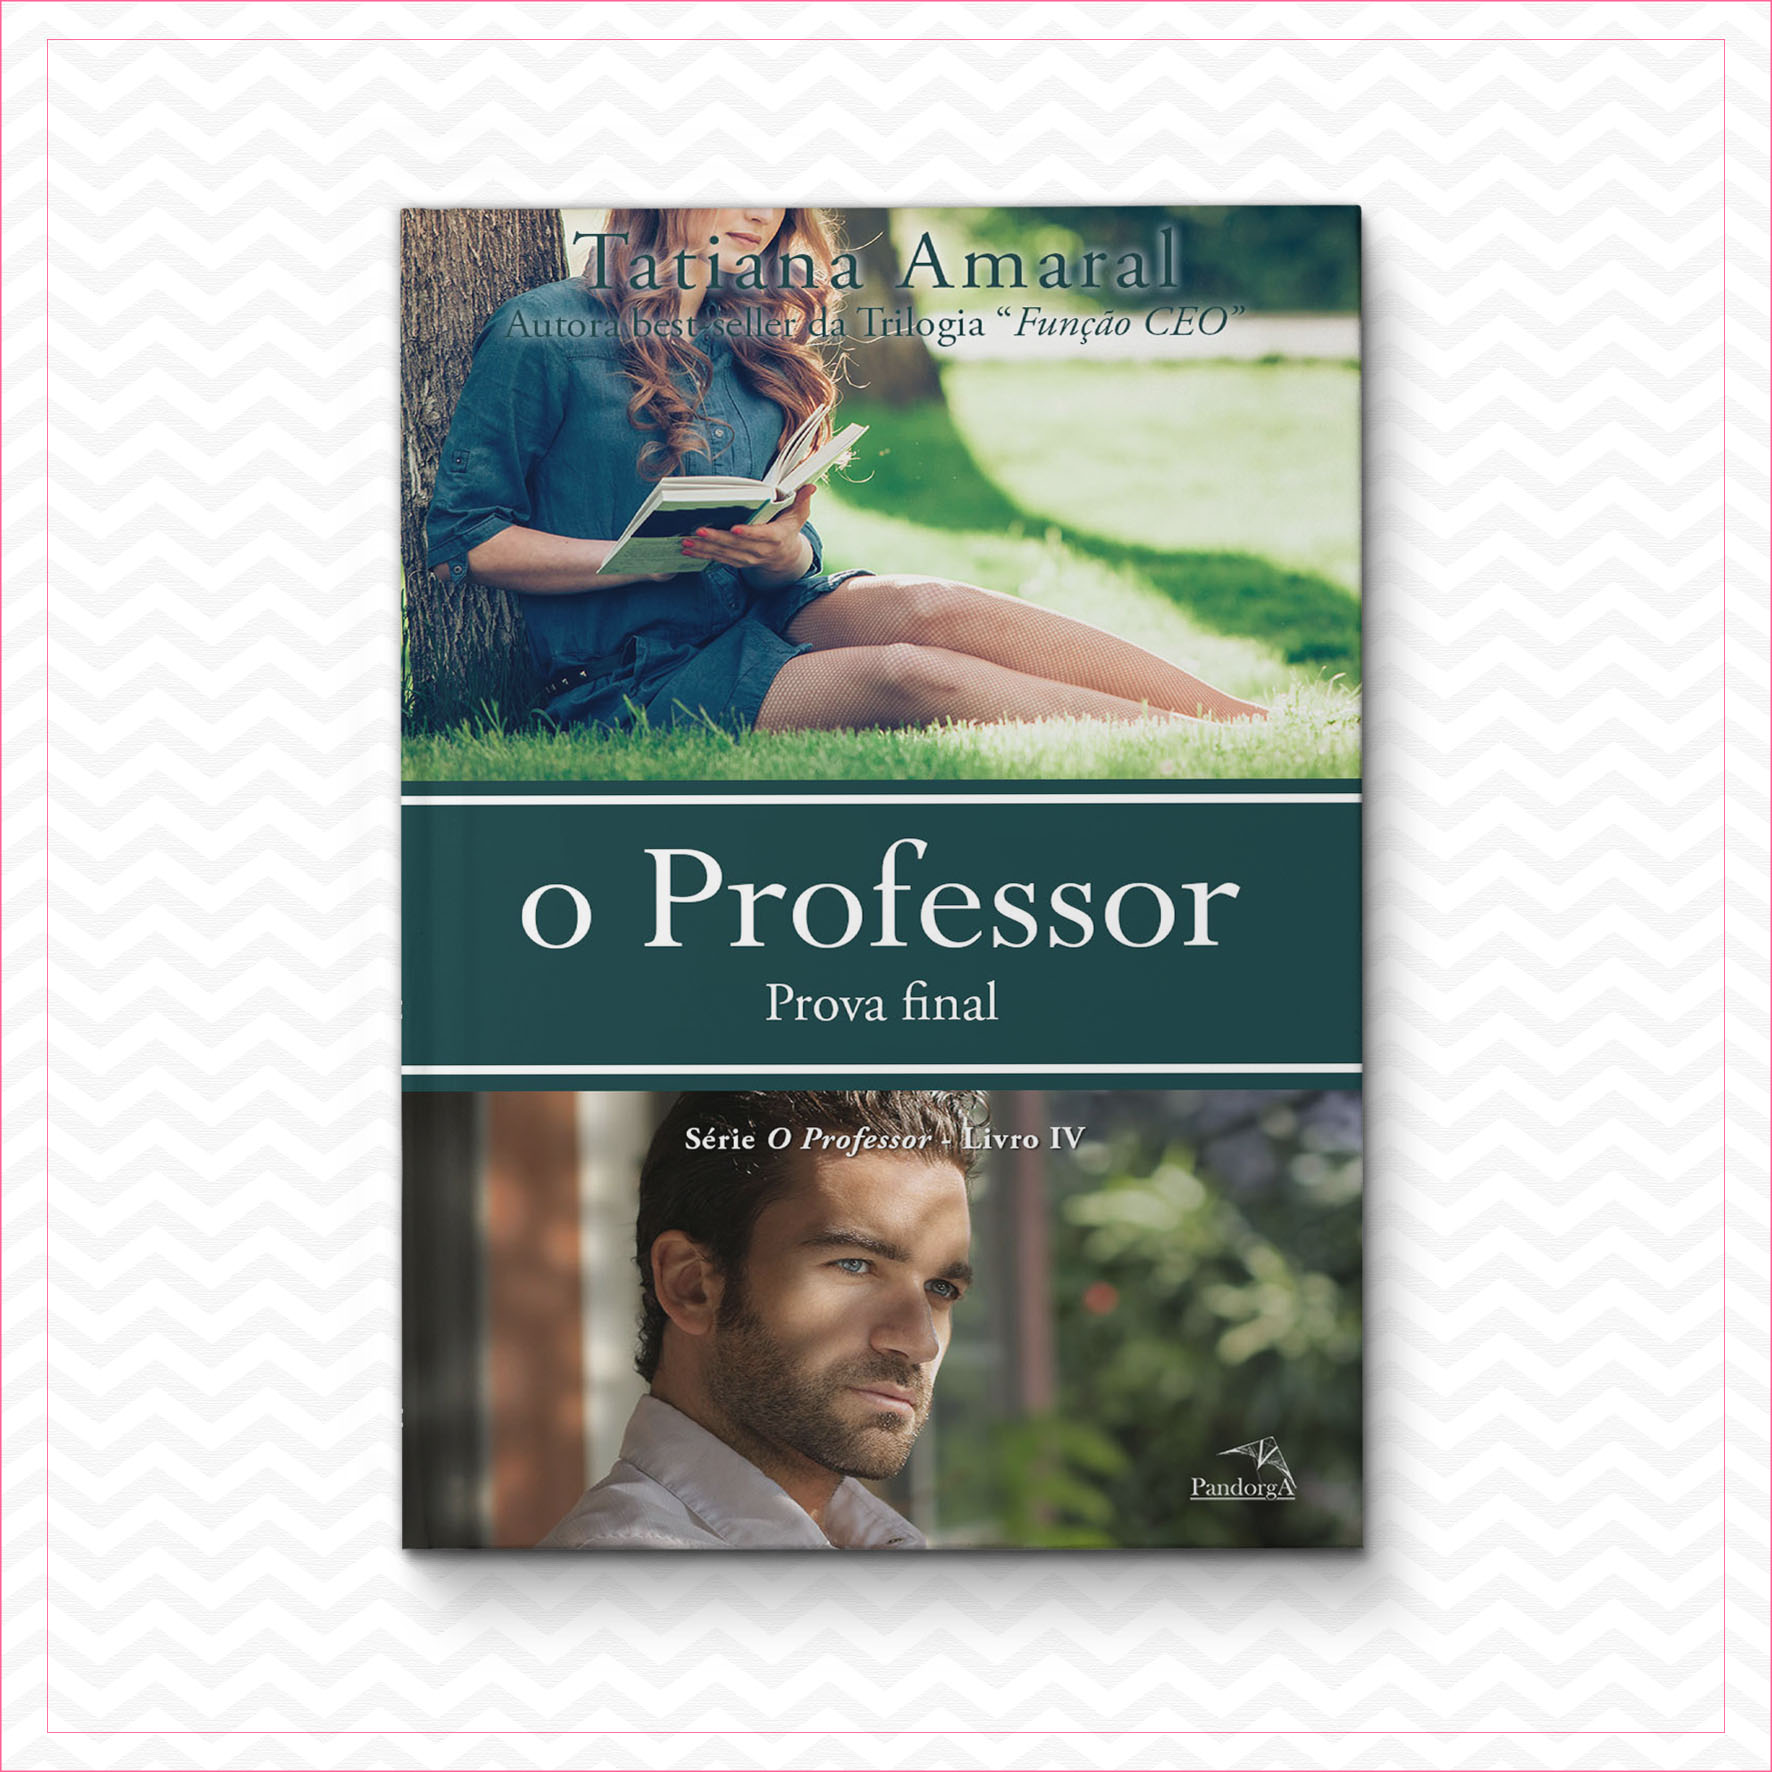 O Professor 4 – Prova Final – Tatiana Amaral